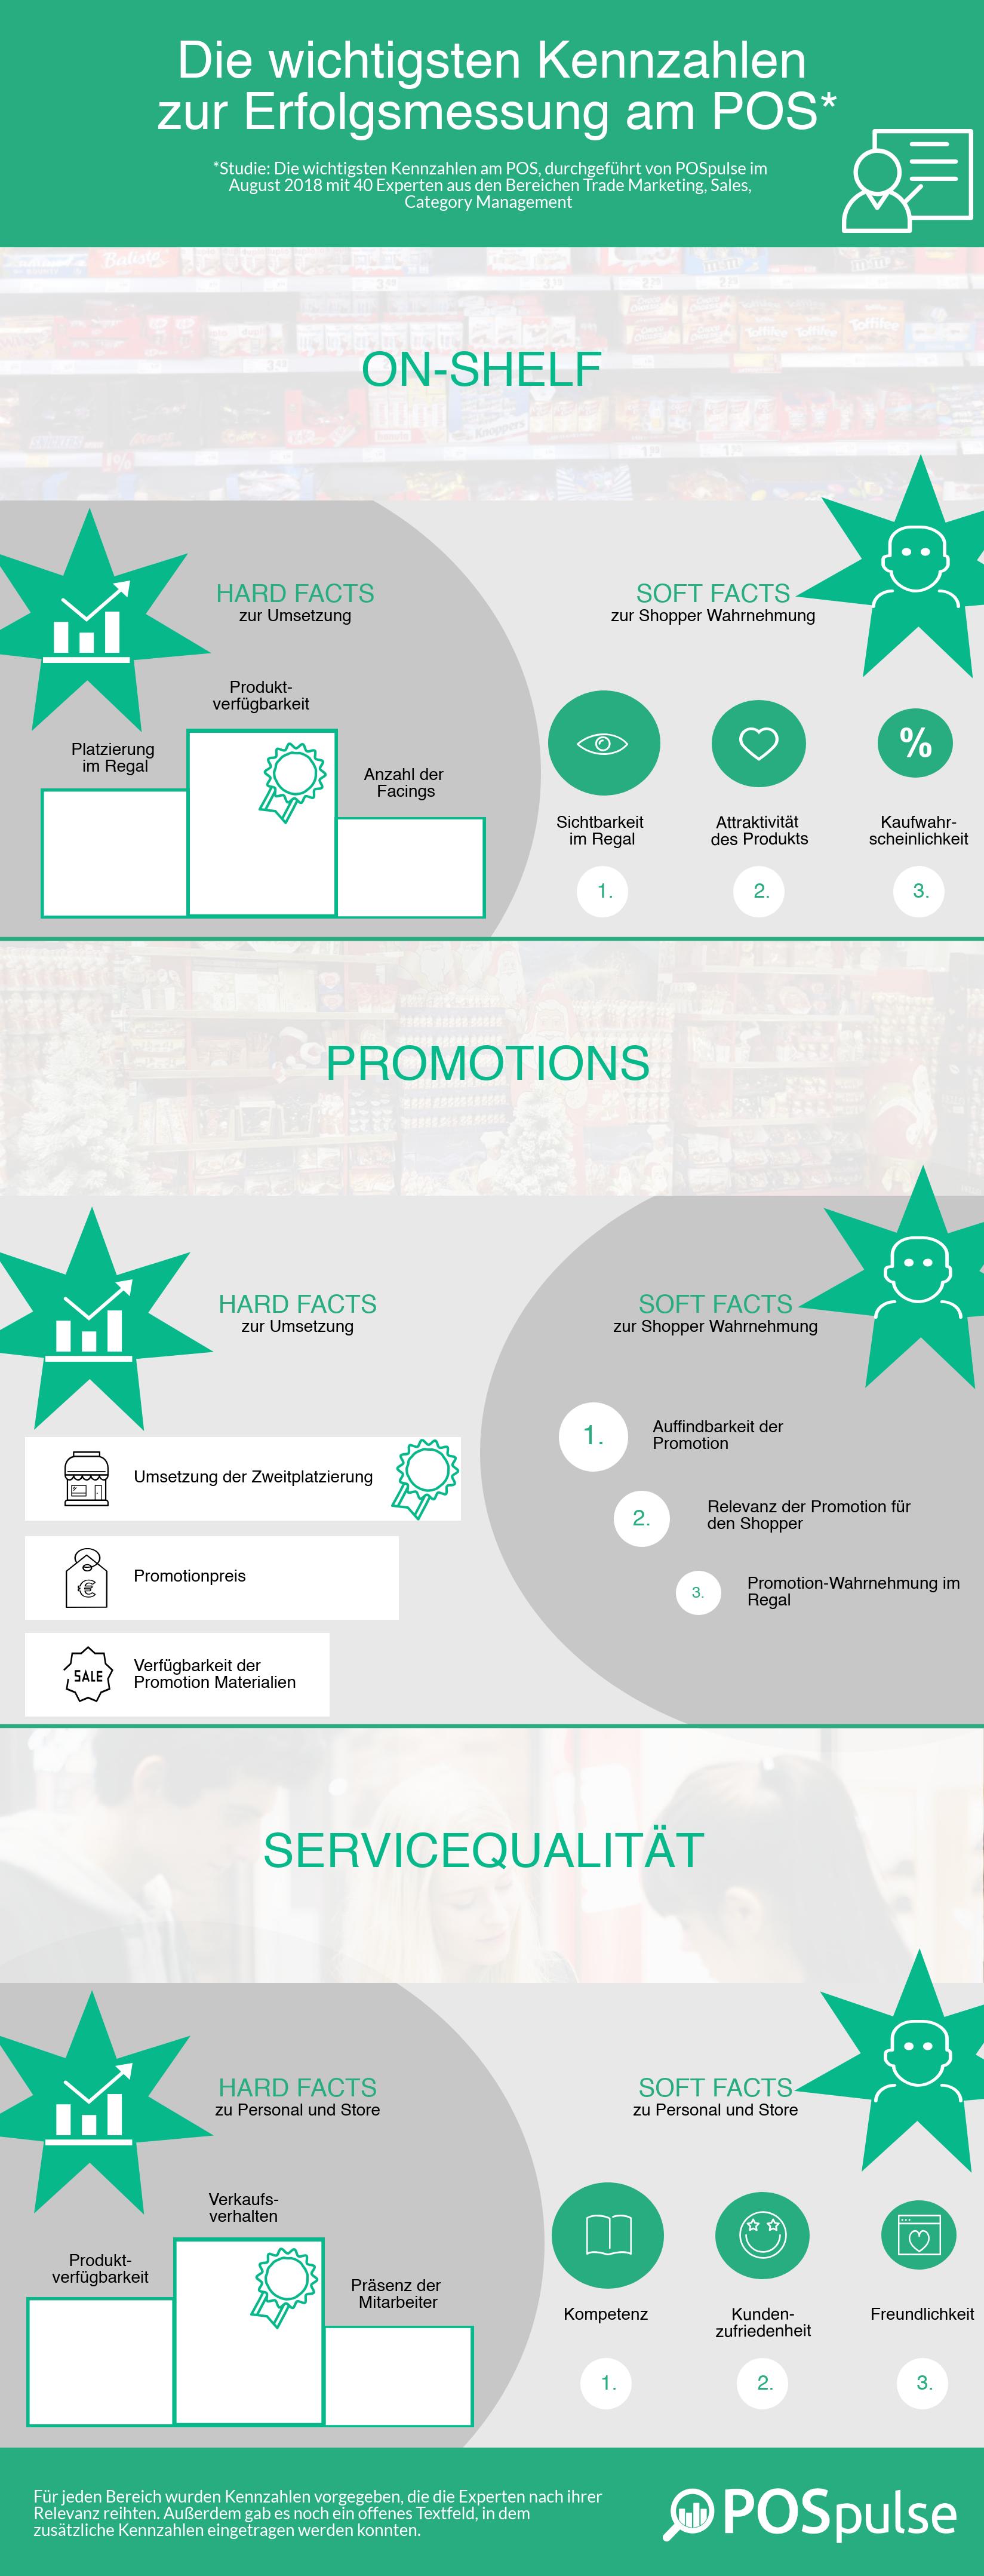 POSpulse_KPI Survey_Infografik-543357-edited